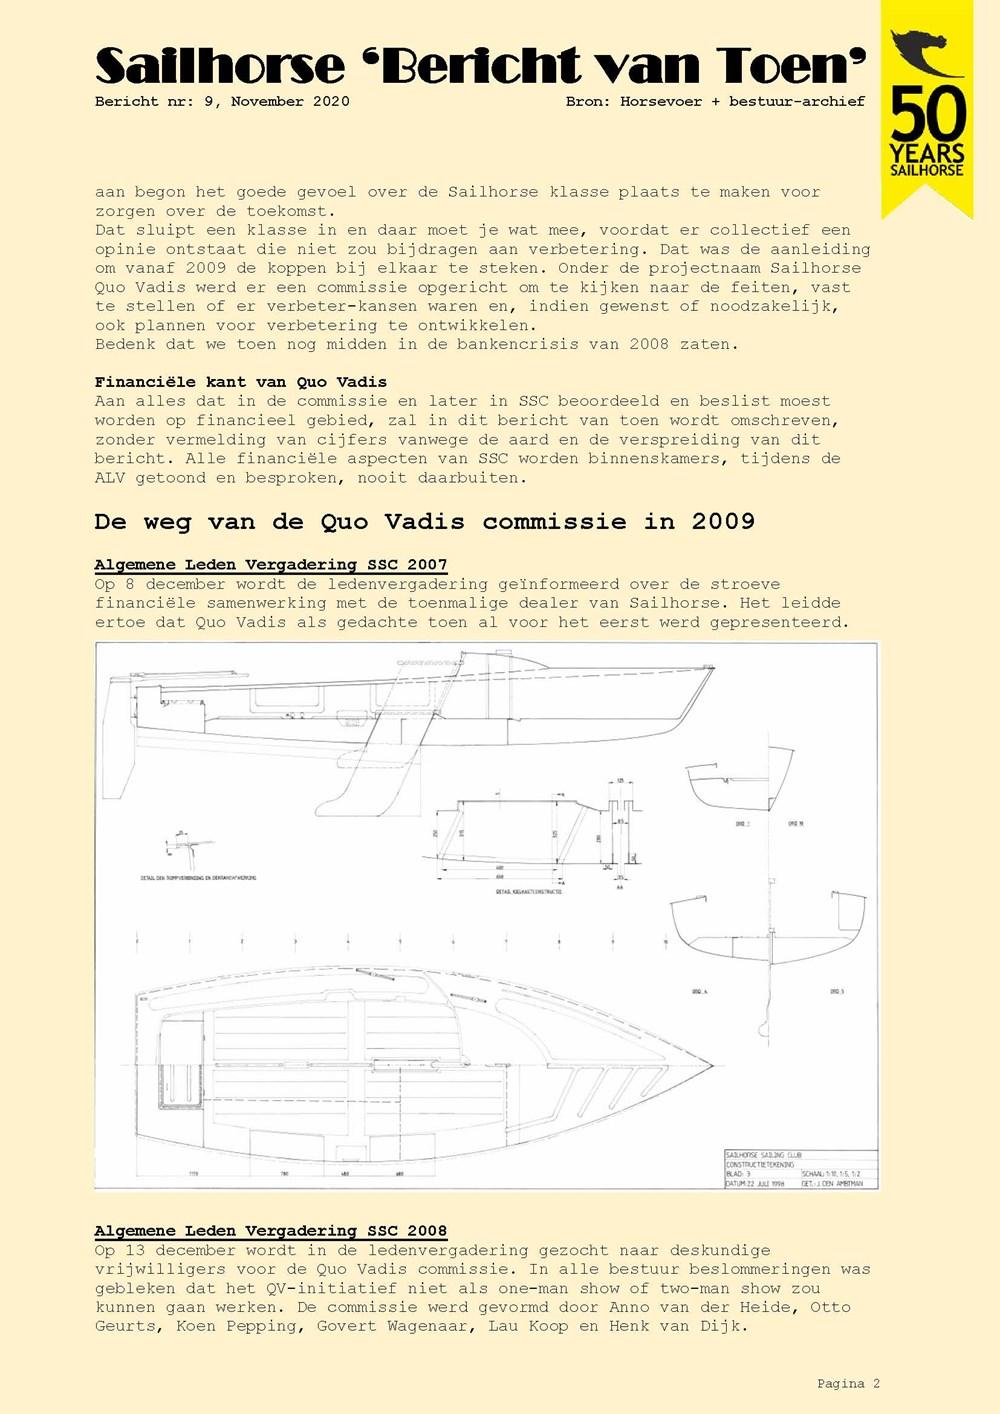 BvT09_Page_02.jpg